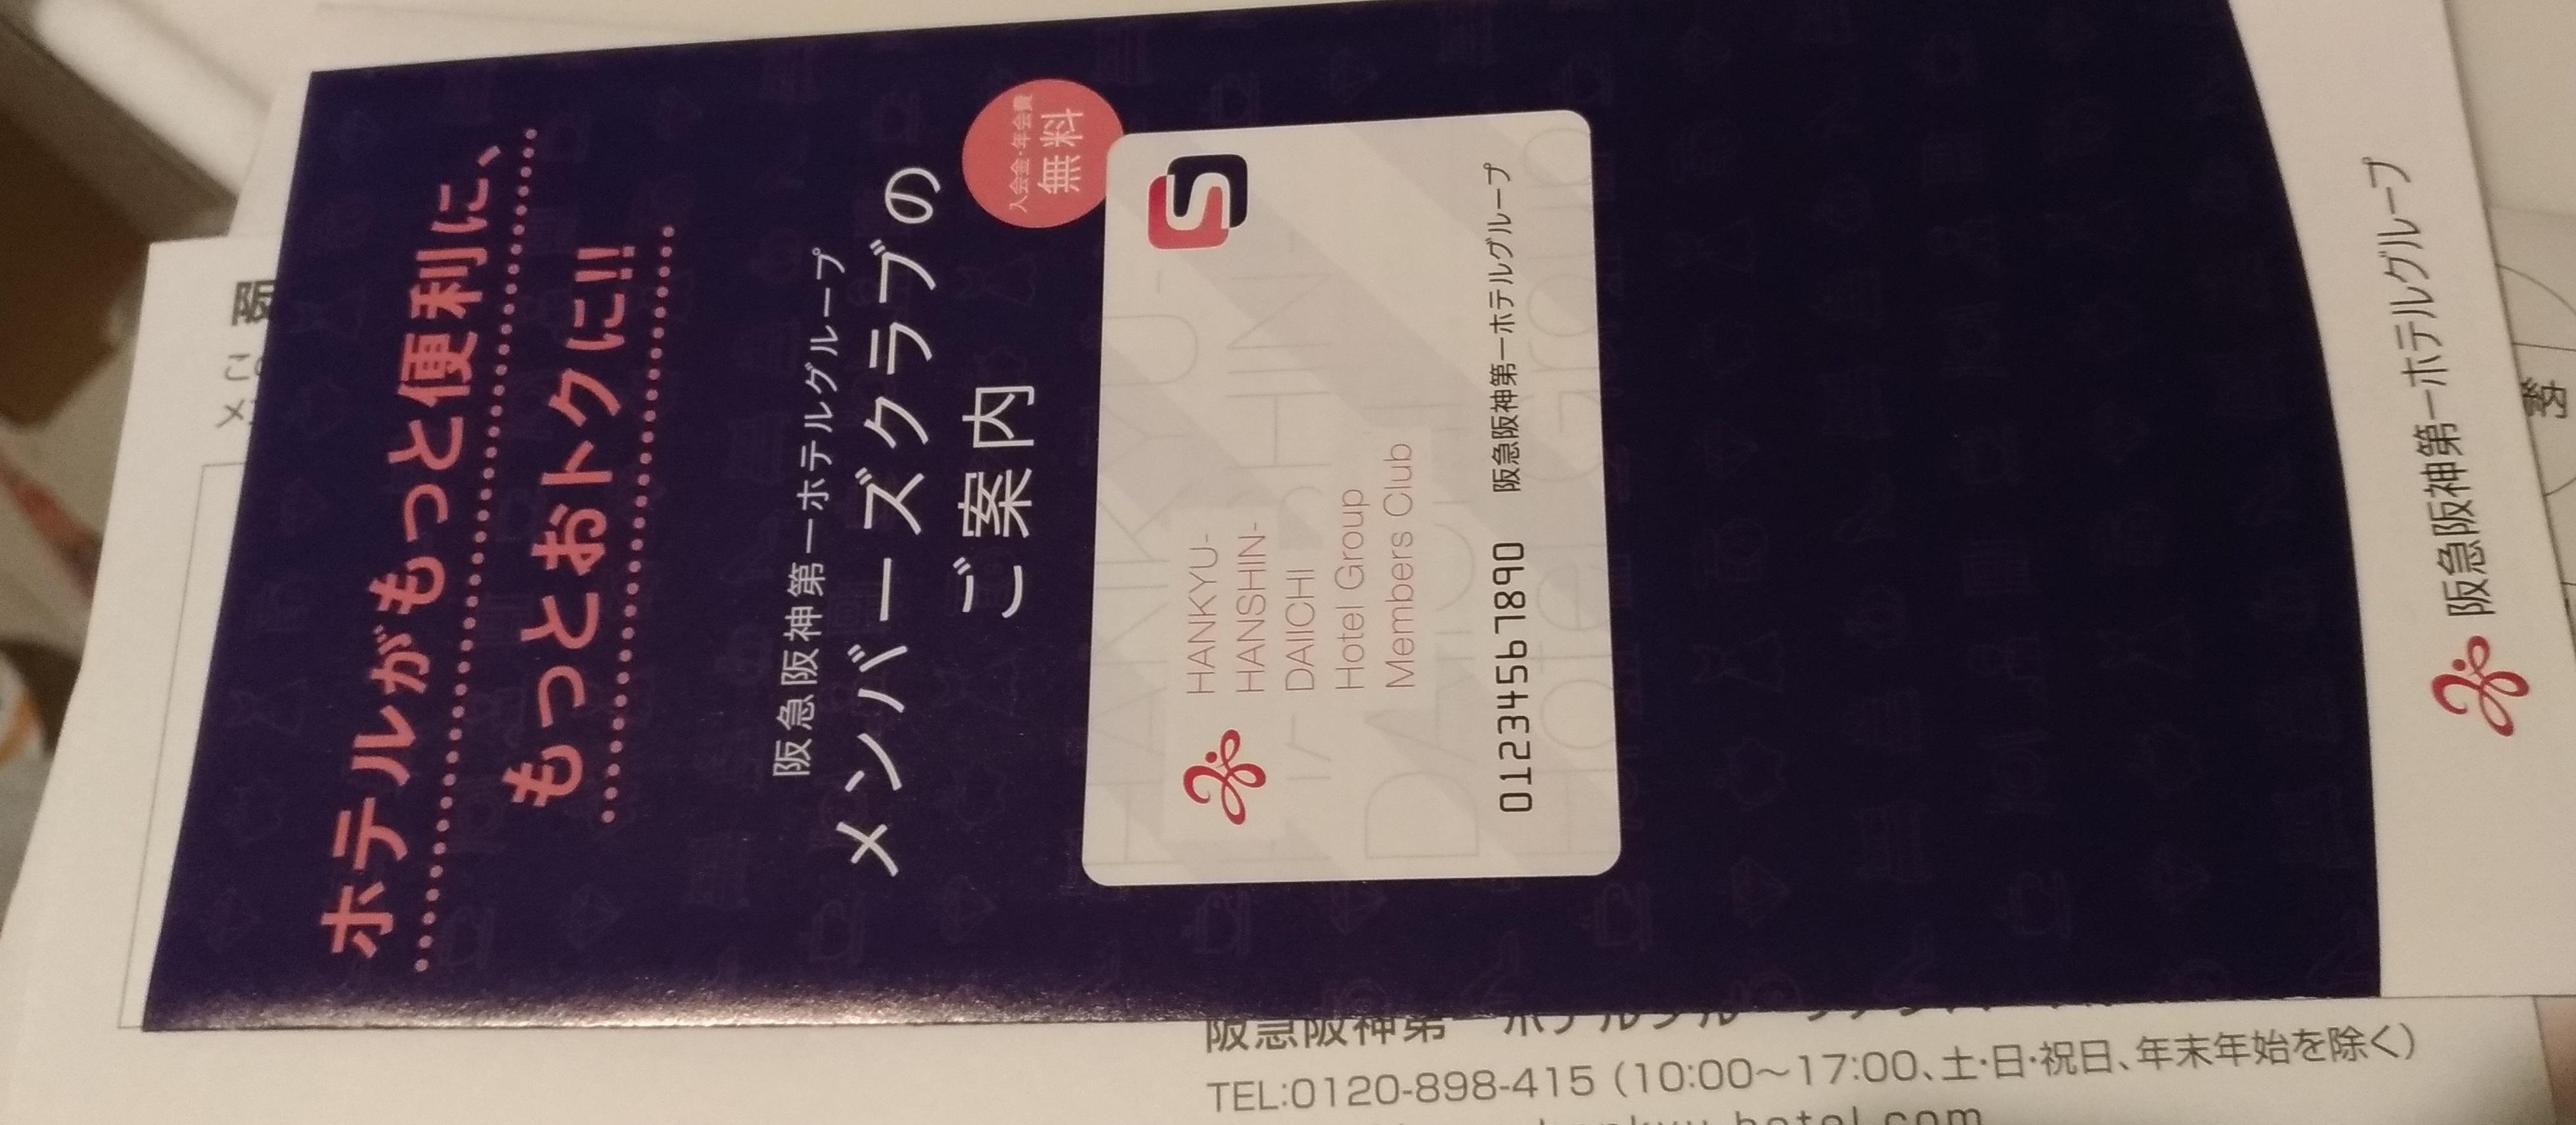 osaka_hotel_hankyu_hanshin_1.jpg